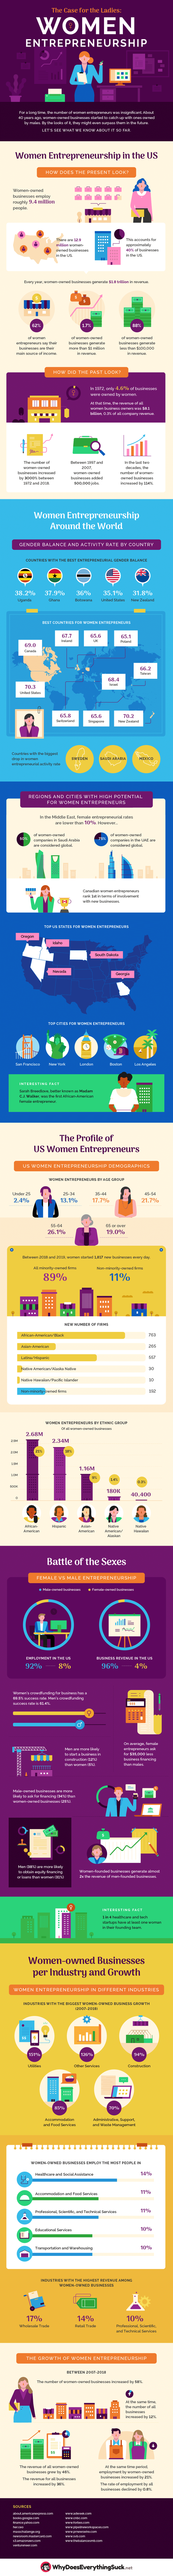 Women Entrepreneurs Statistics Infographic